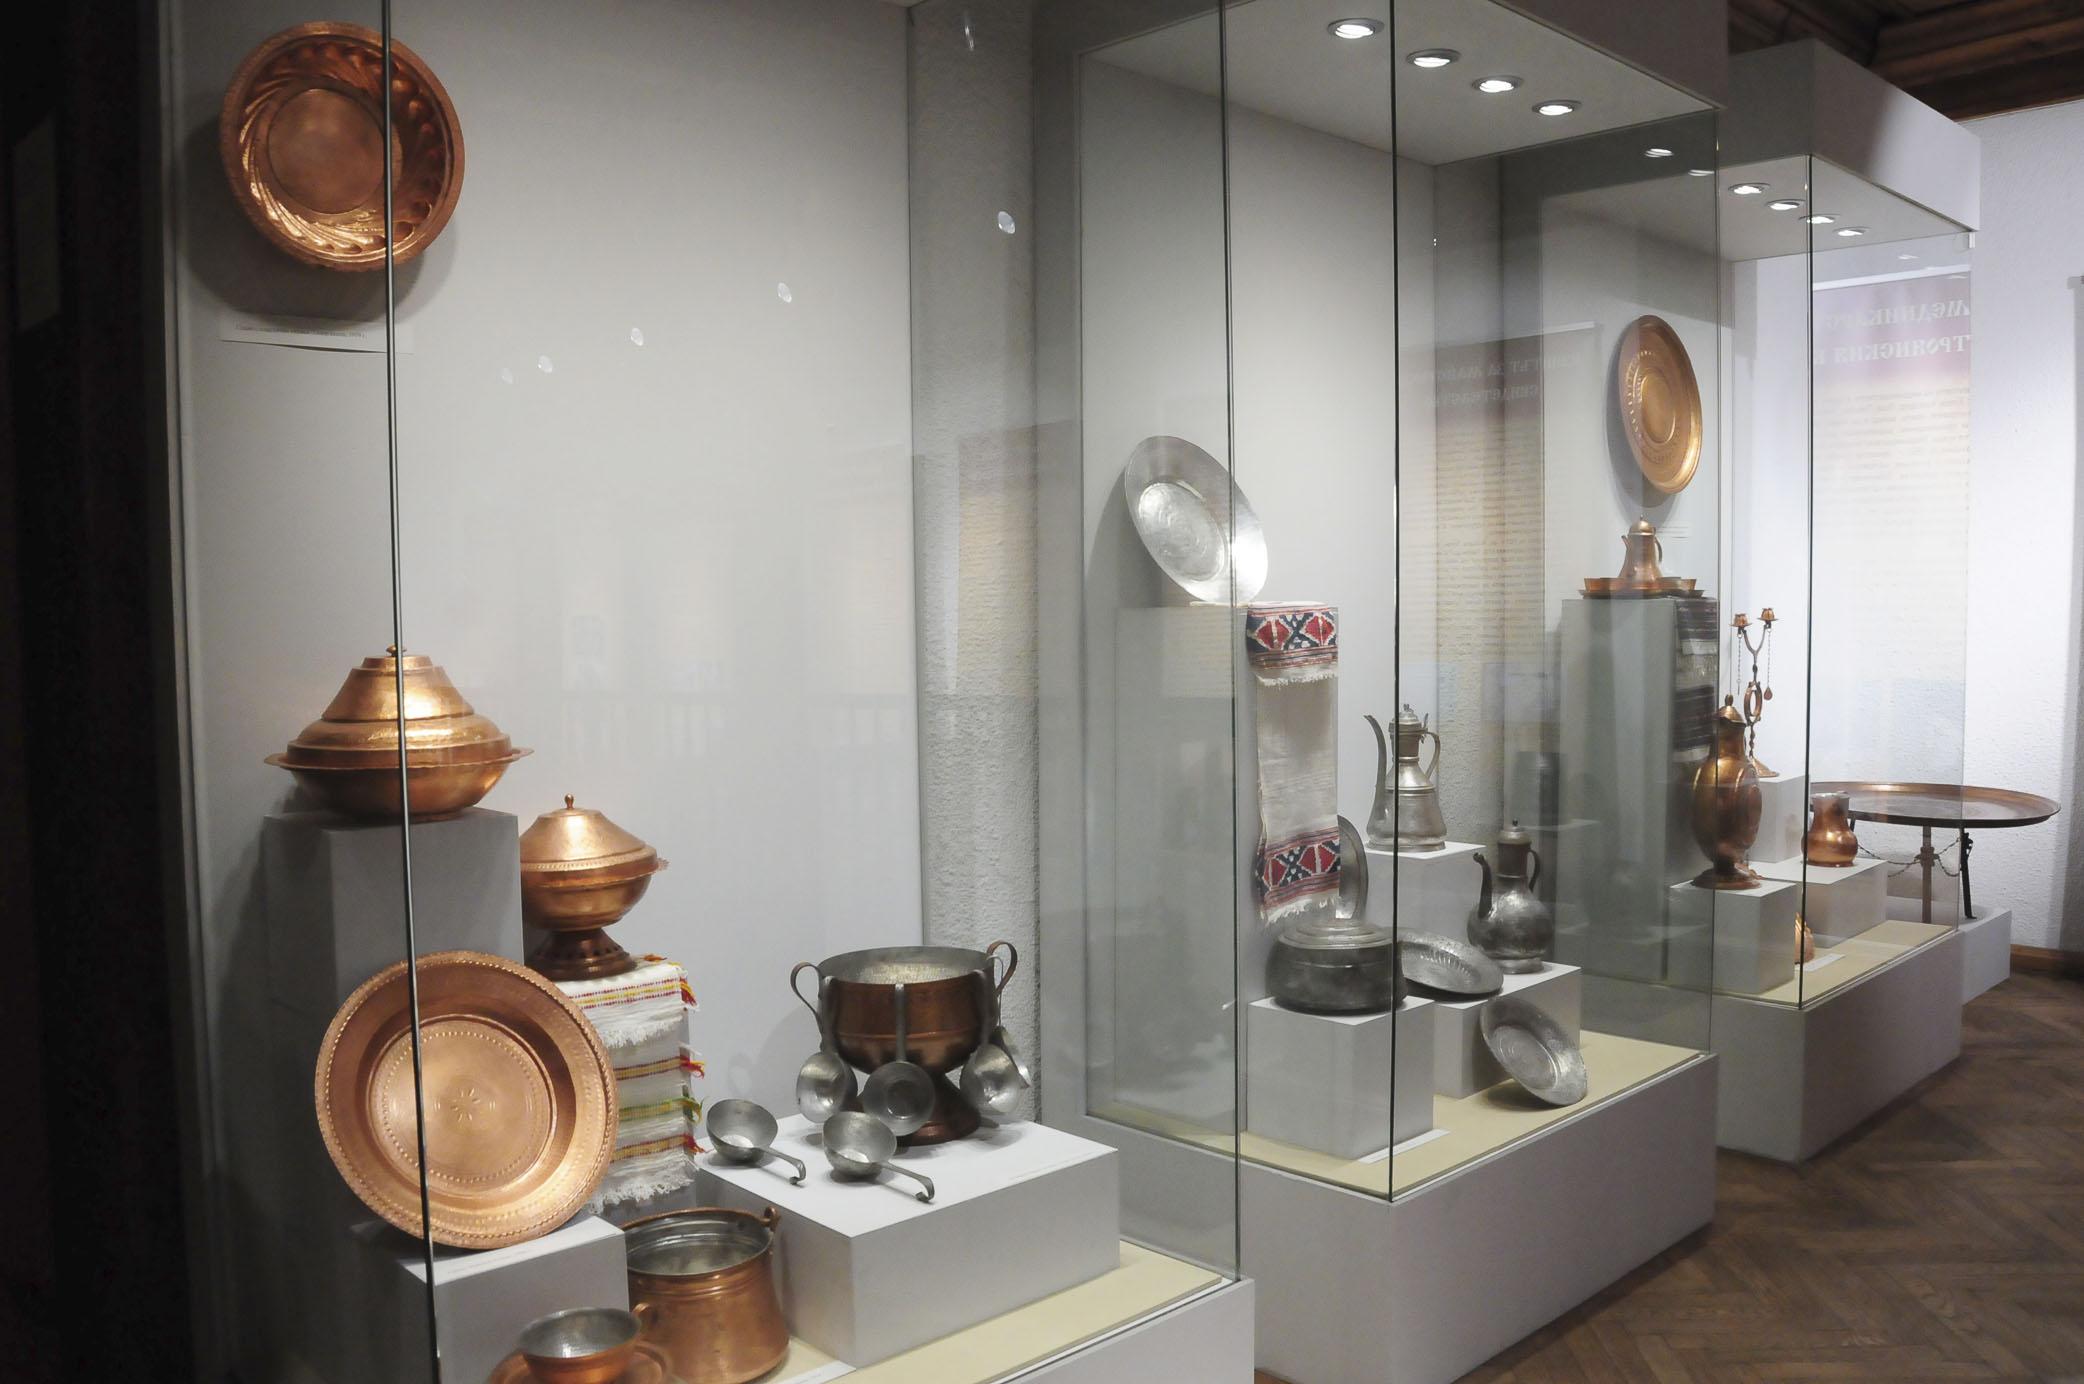 troyan-museum-mednikarstvo-ot-troyanskiq-krai-28